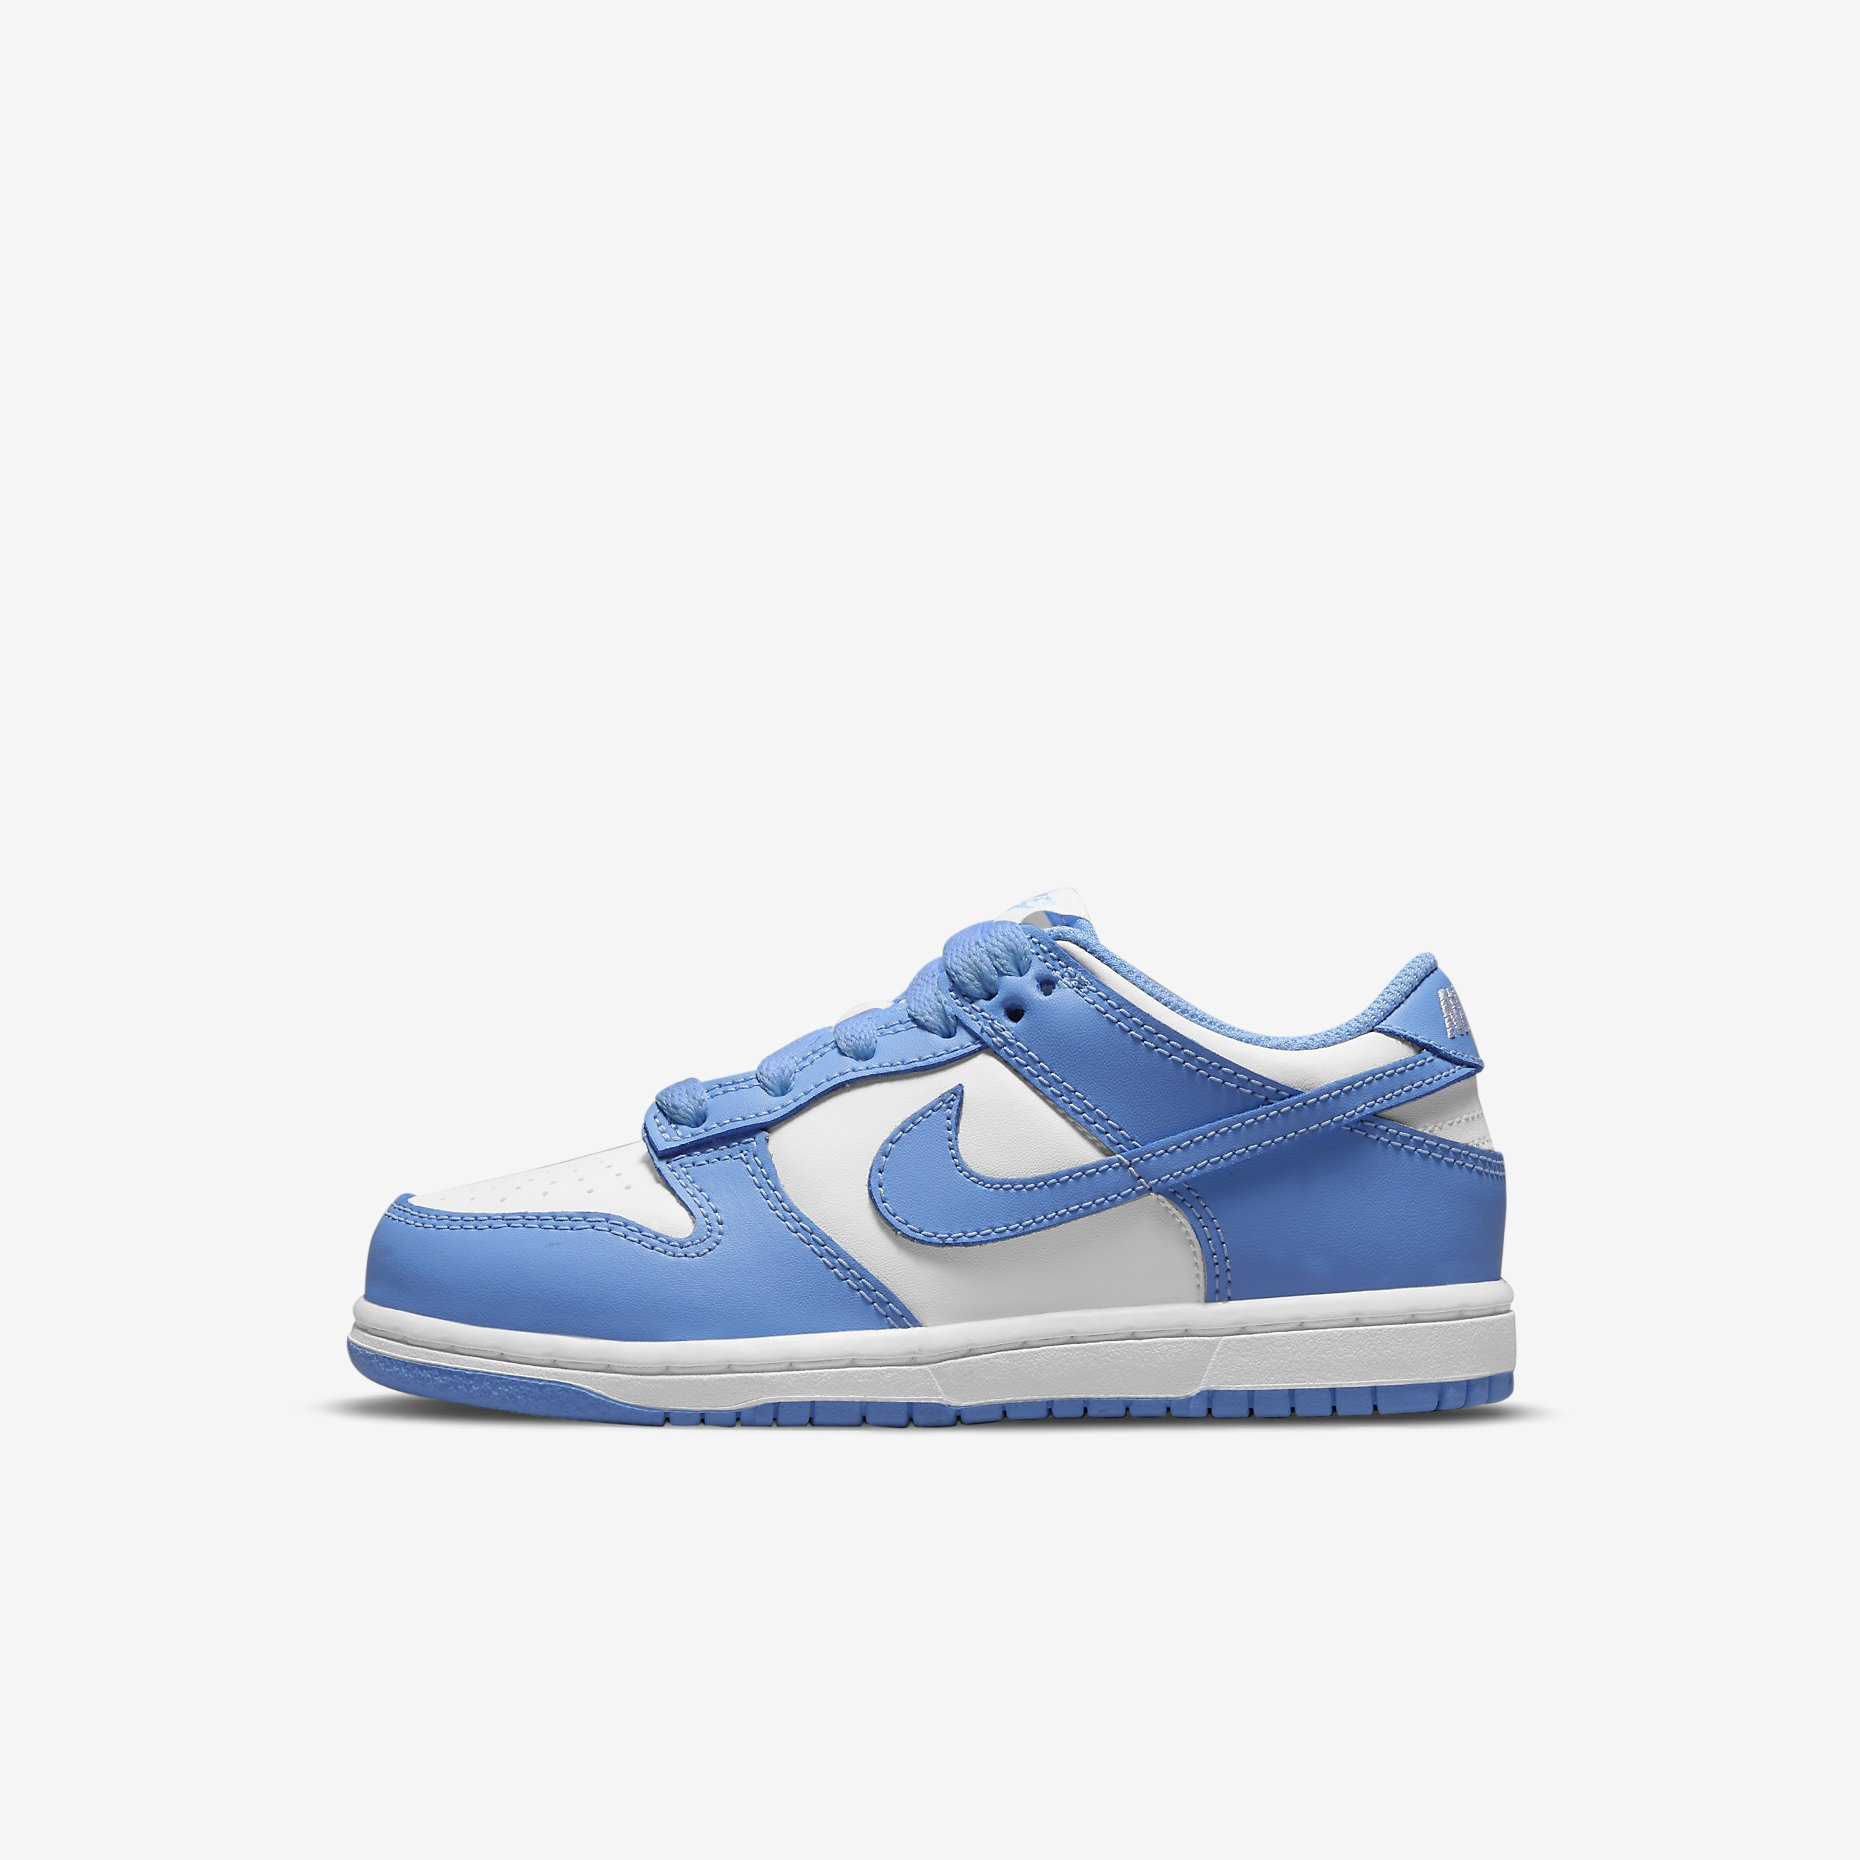 Nike Dunk Low PS 'University Blue'}